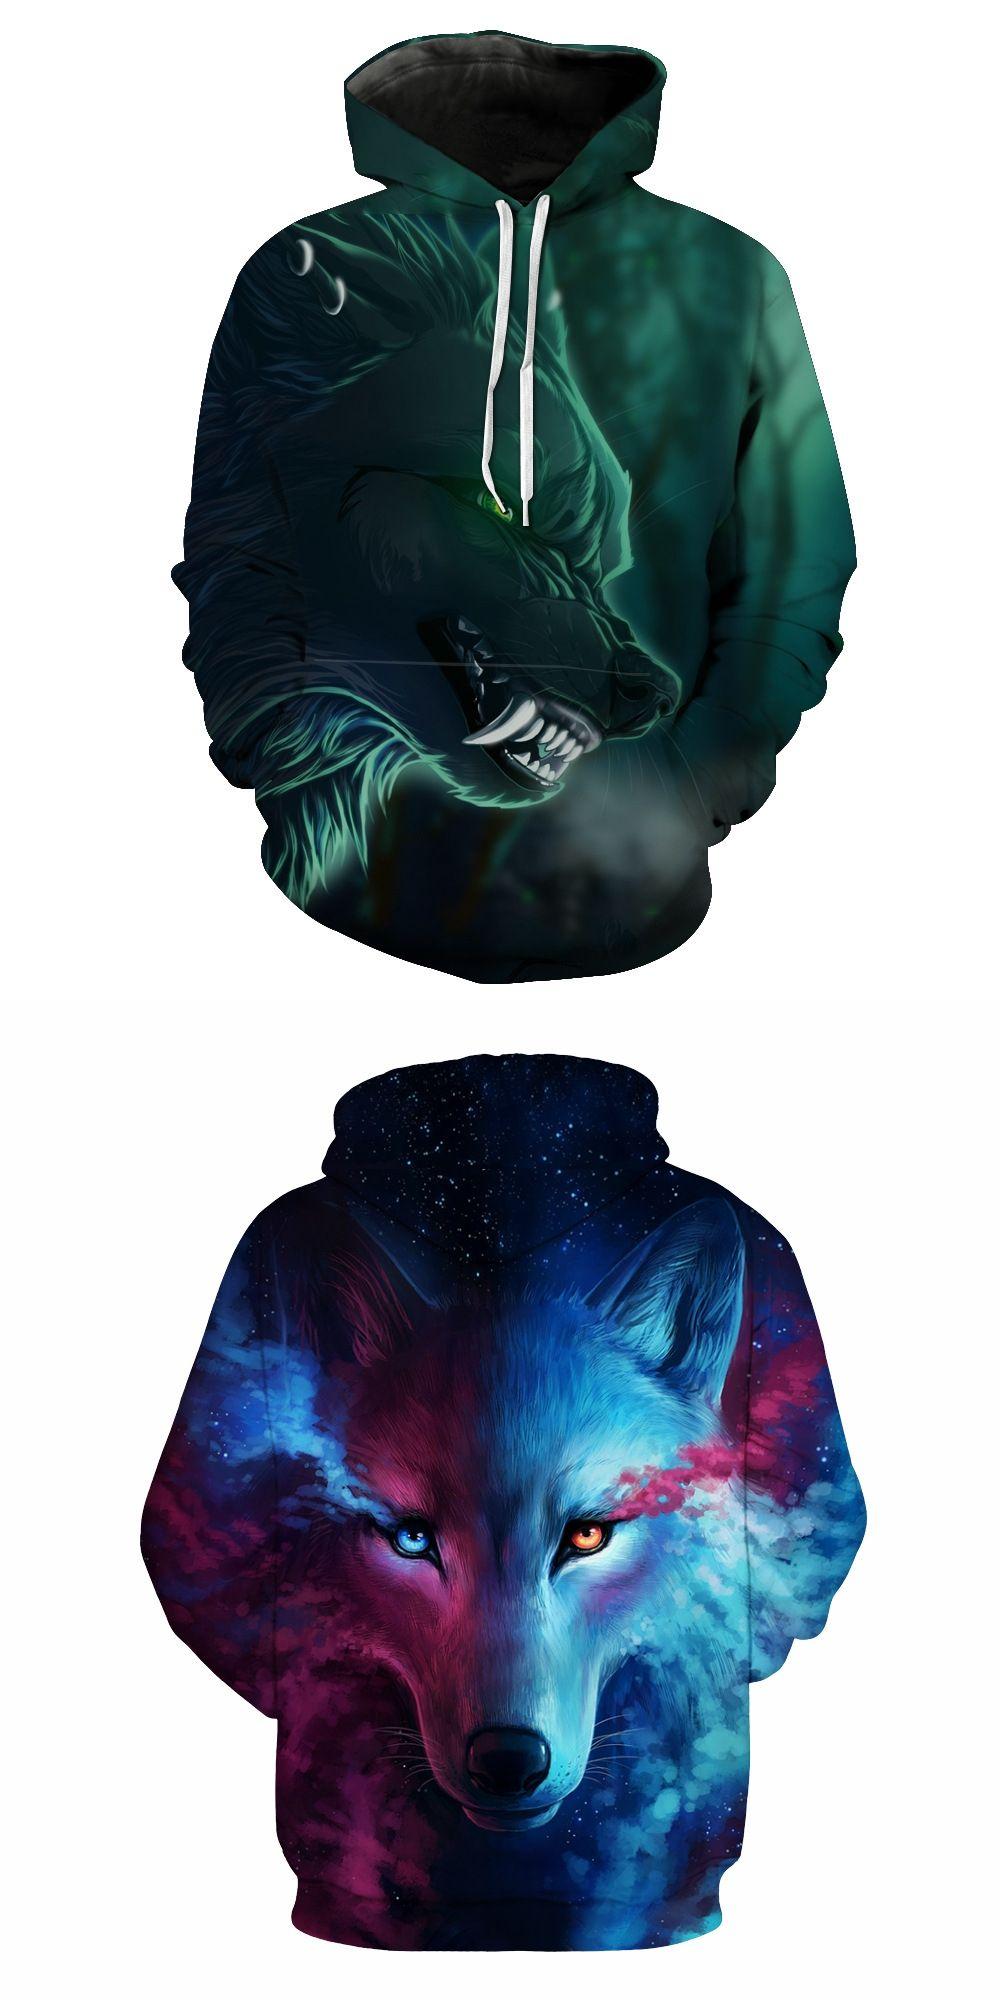 893f9c68344 2018 New Design Galaxy Space Wolf 3D Print Men Hoodies Sweatshirt Men  Pullover Fashion Tracksuits Animal hoodies Streetwear